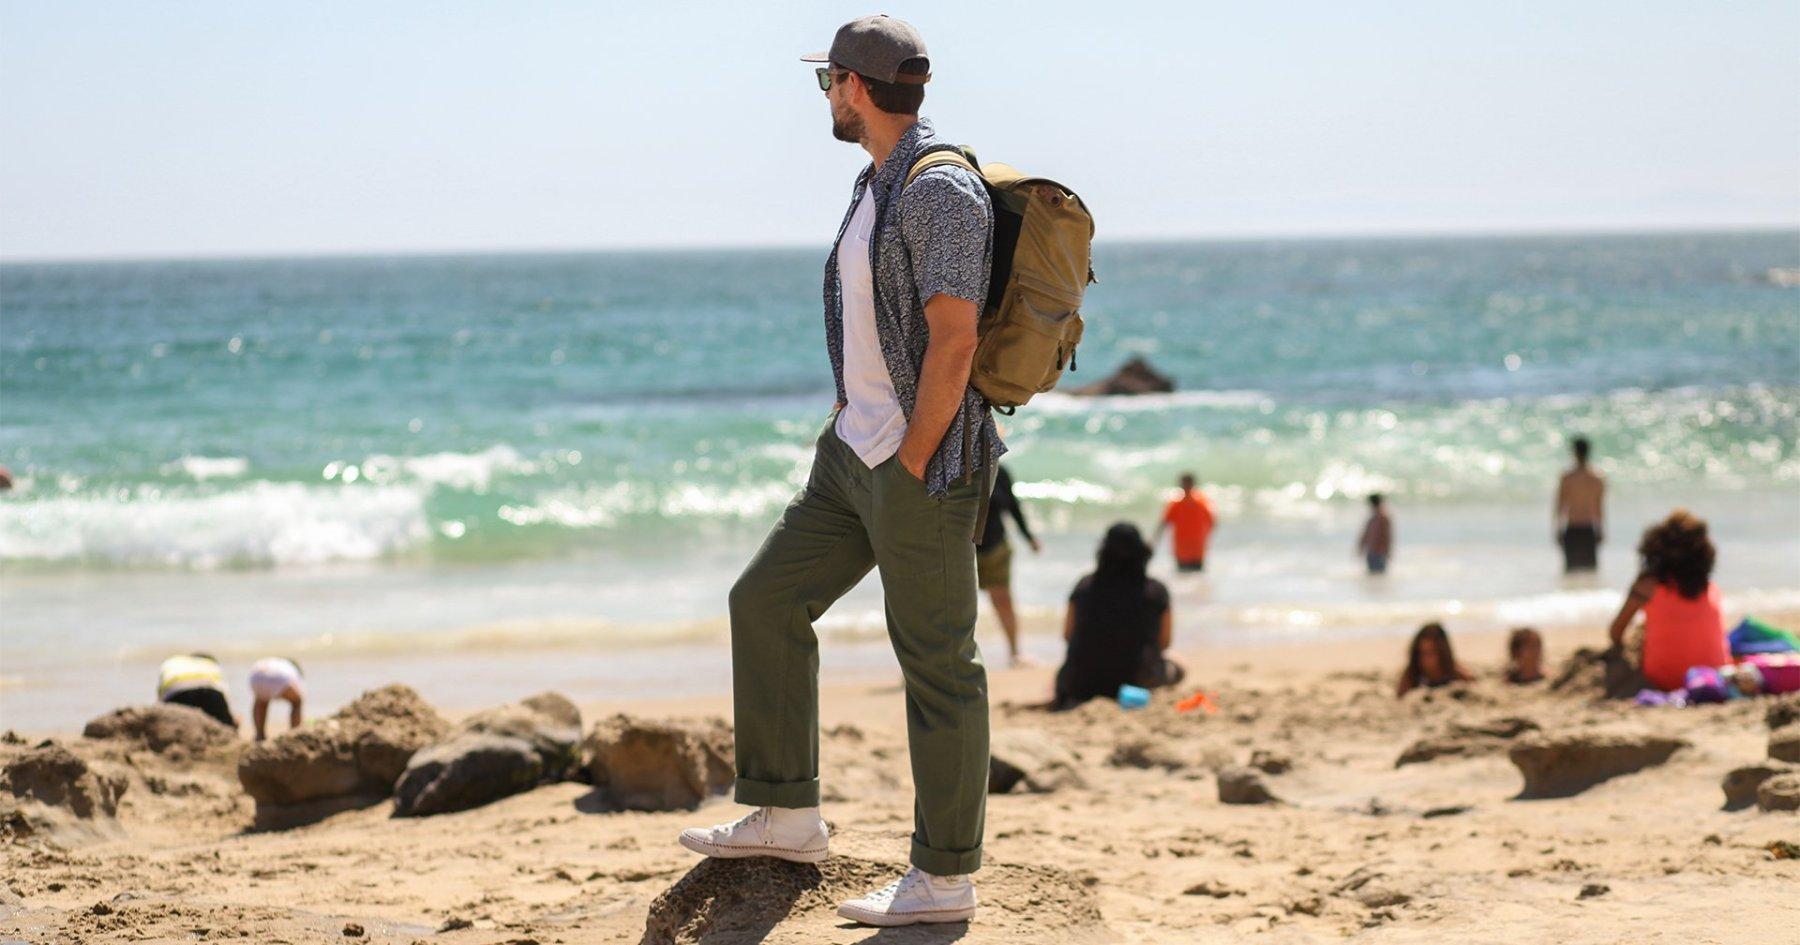 Wanna Turn Heads on the Beach? Wear This.